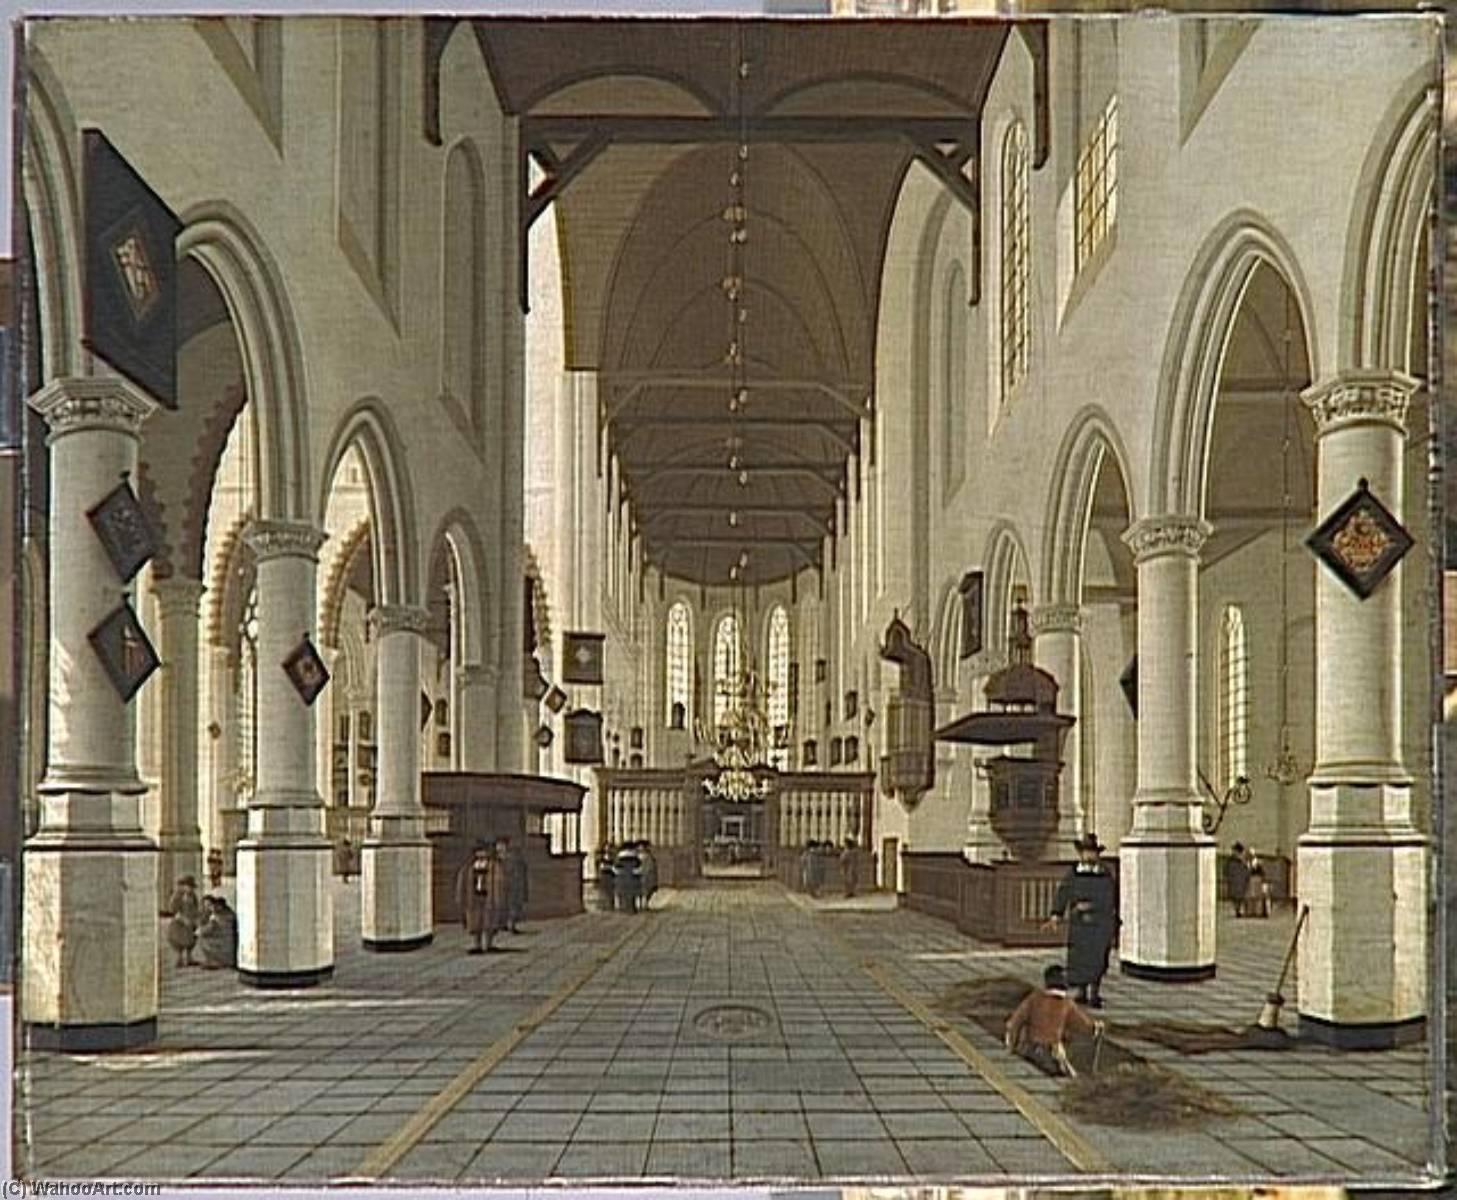 http://pt.wahooart.com/Art.nsf/O/AQSPAZ/$File/Hendrick-Cornelisz-van-Vliet-Interieur-de-l-Oude-Kerk-a-Delft.jpg